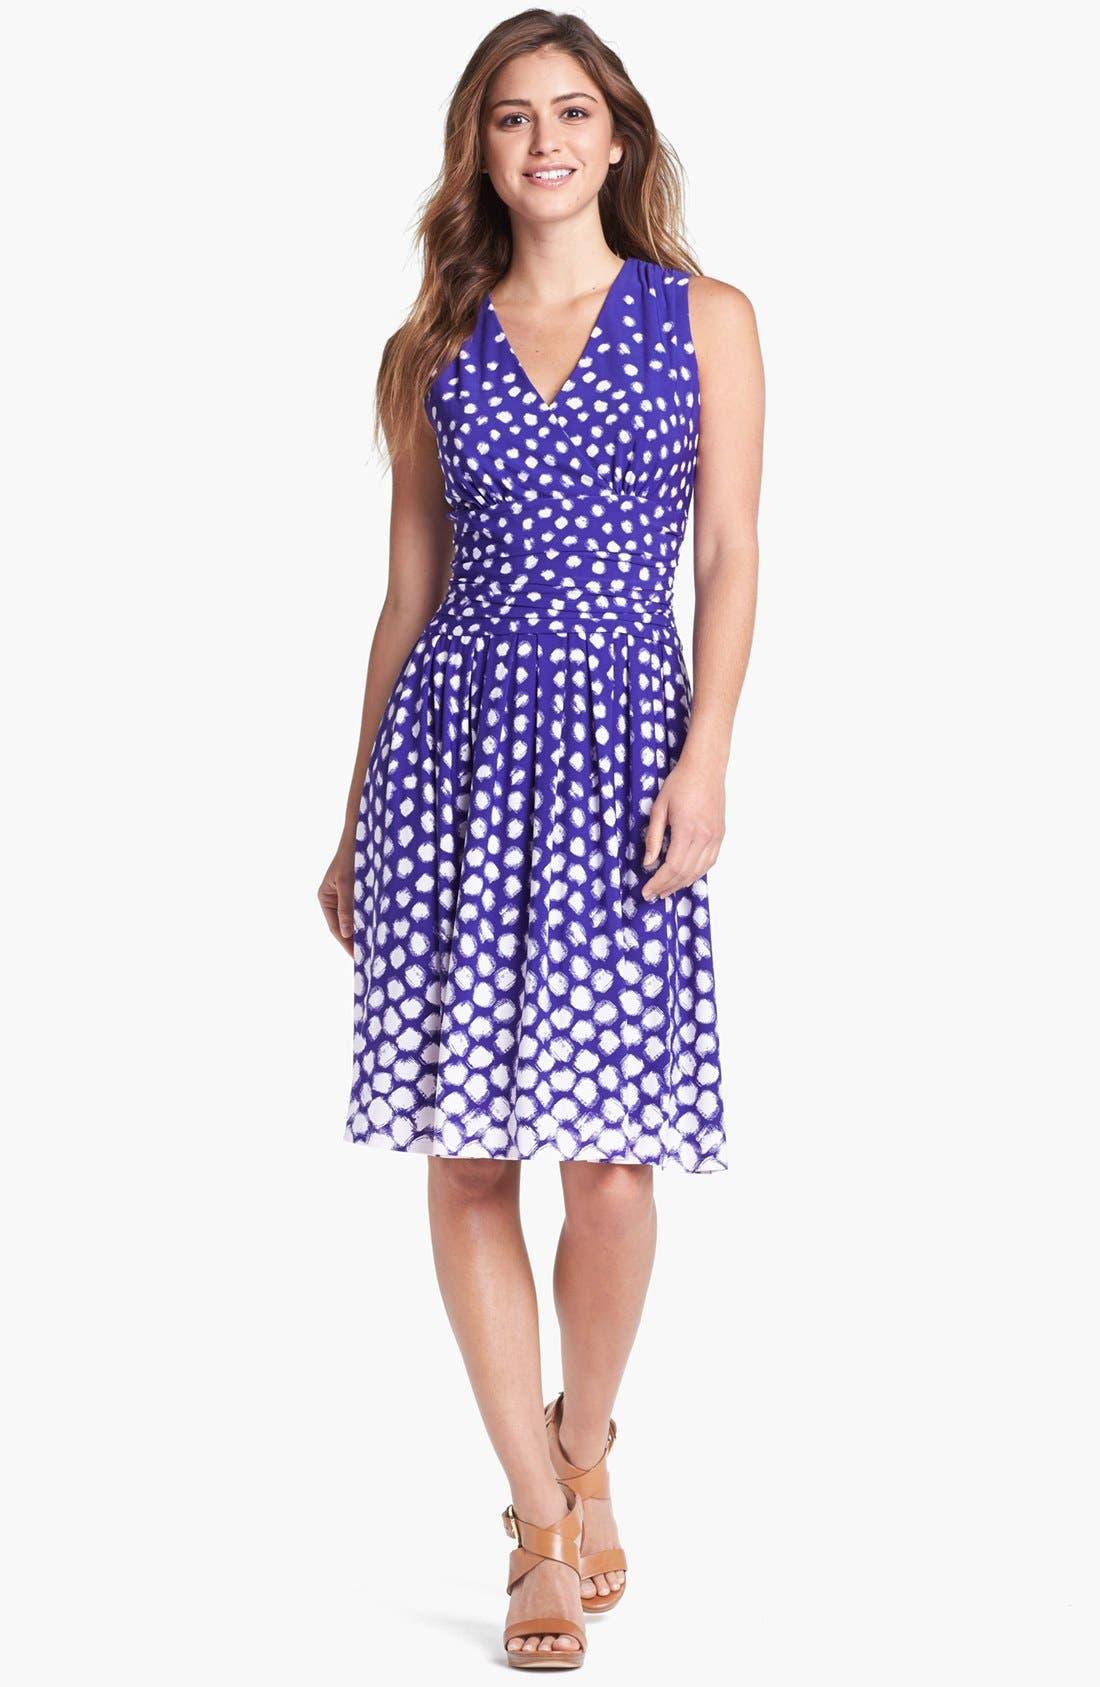 Alternate Image 1 Selected - Eliza J Dot Print Fit & Flare Dress